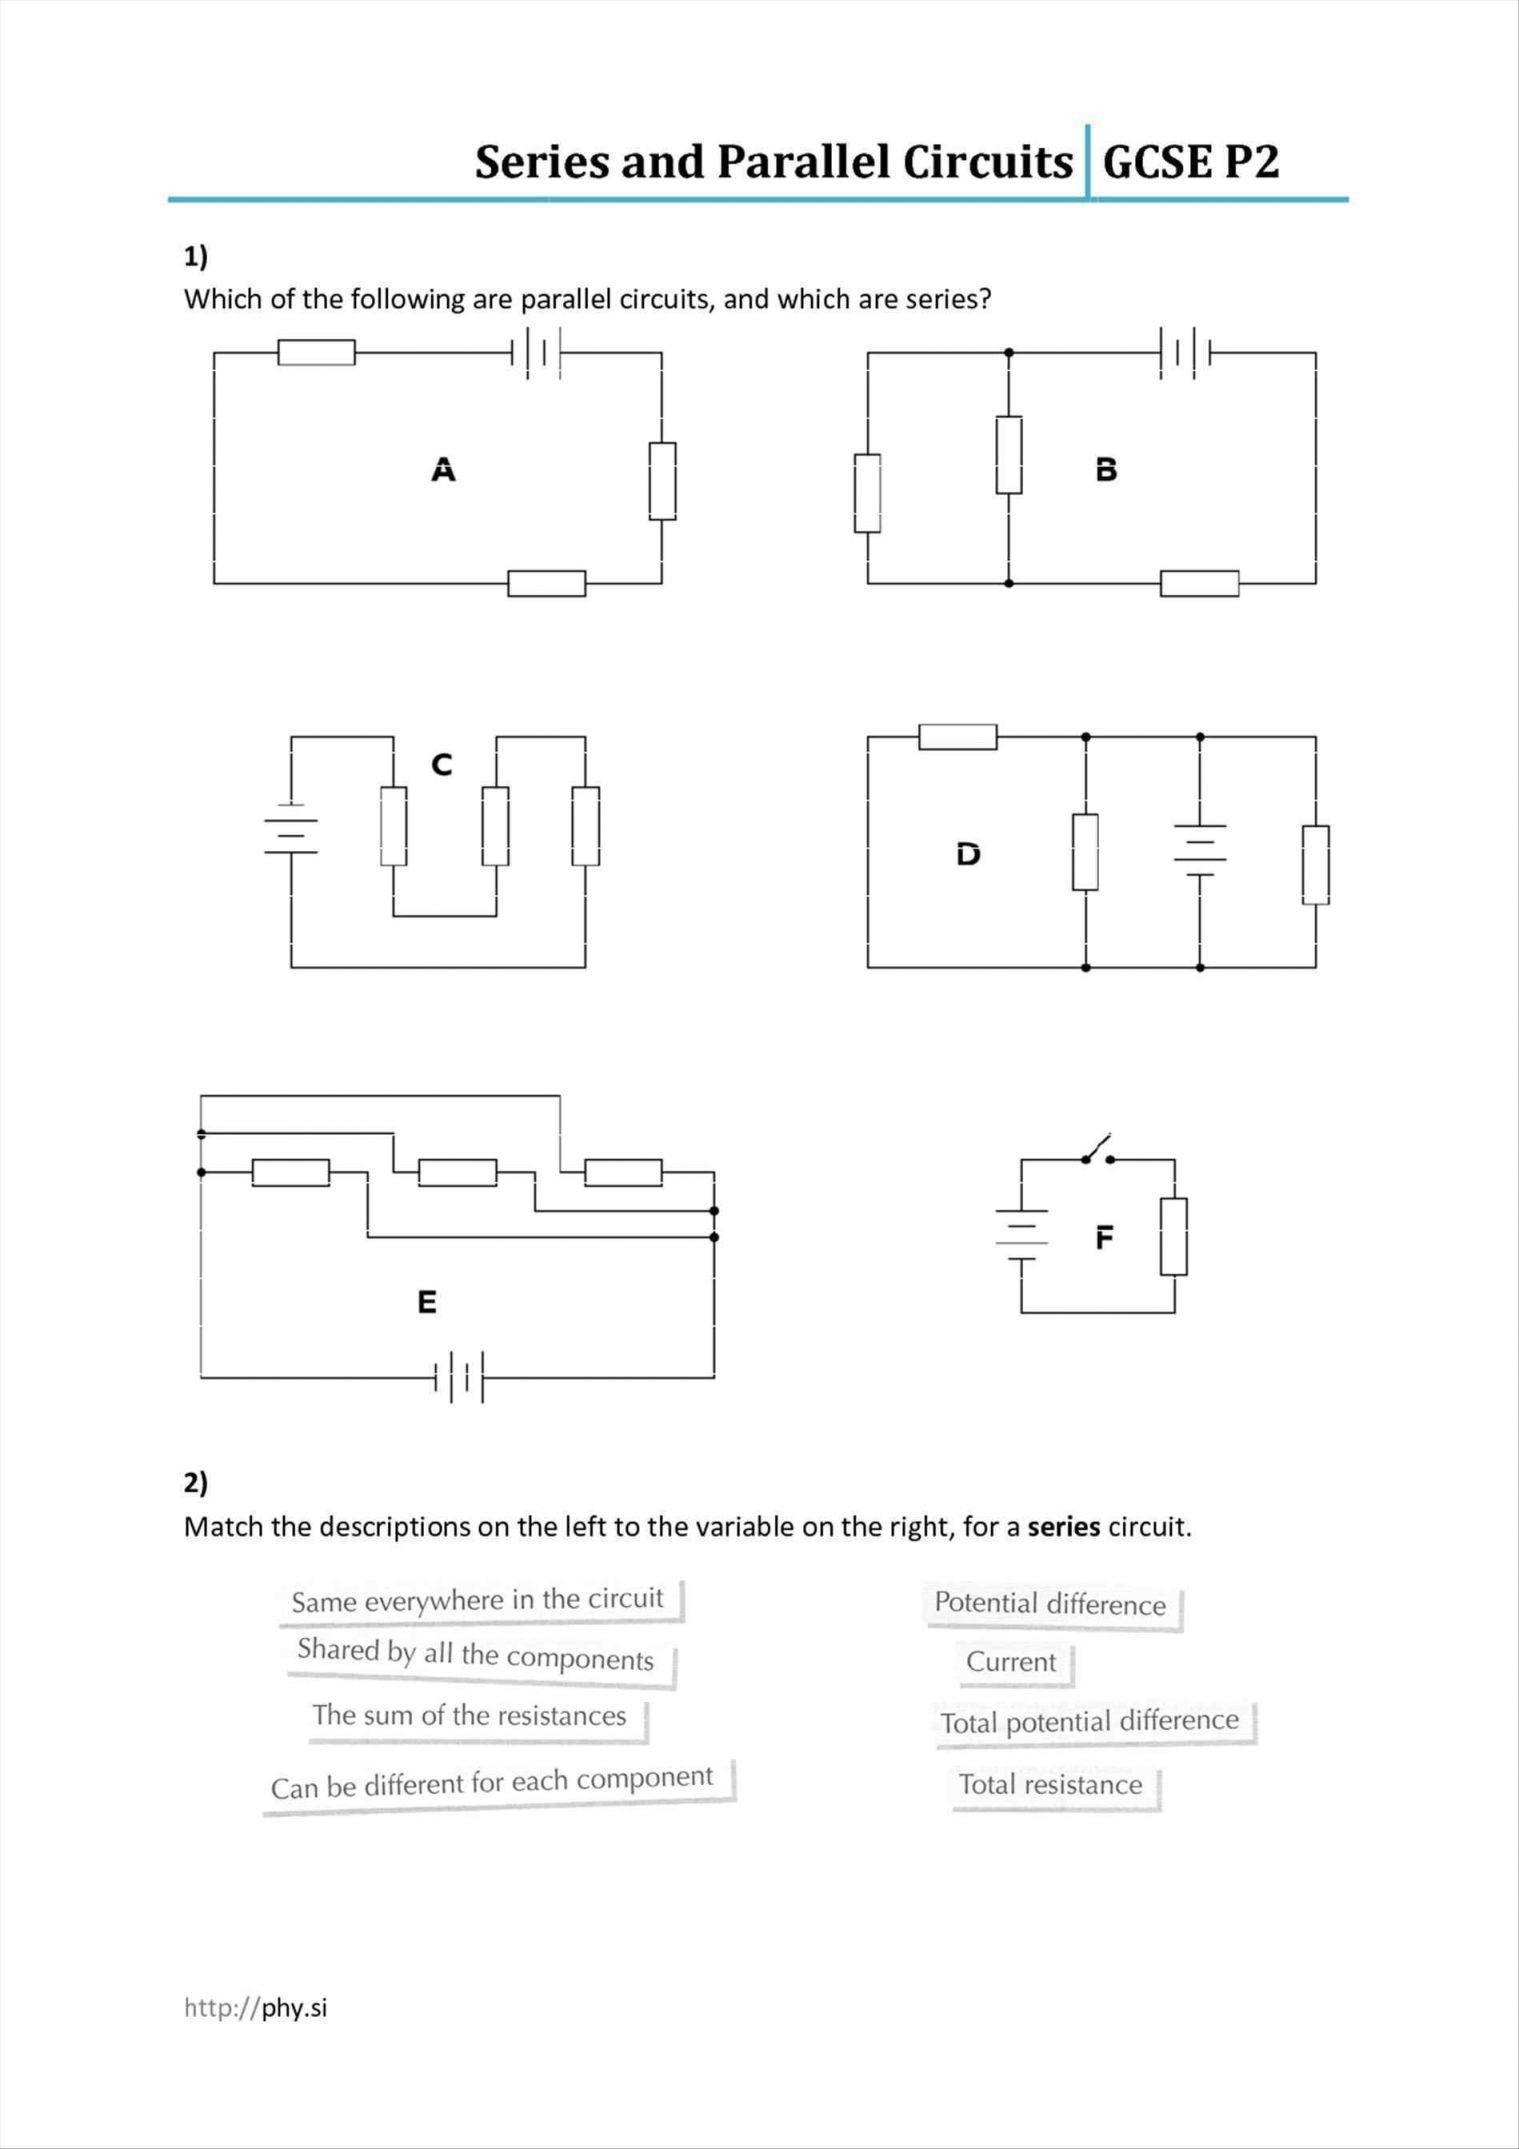 Inspirational Circuits and Symbols Worksheet